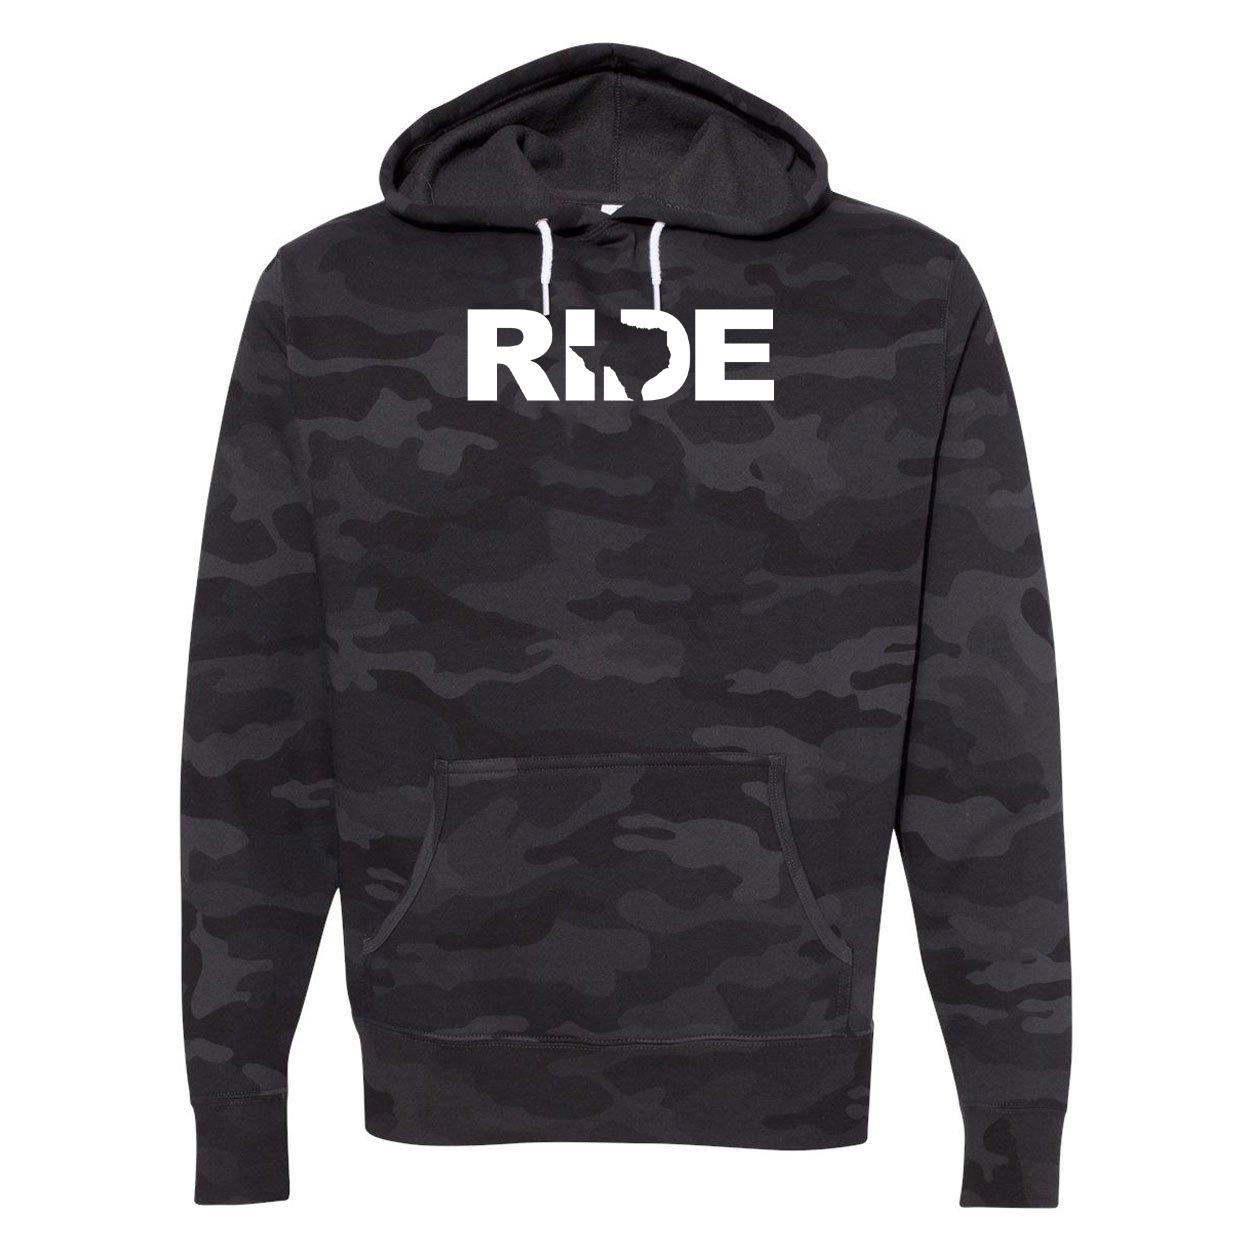 Ride Texas Classic Unisex Hooded Sweatshirt Black Camo (White Logo)